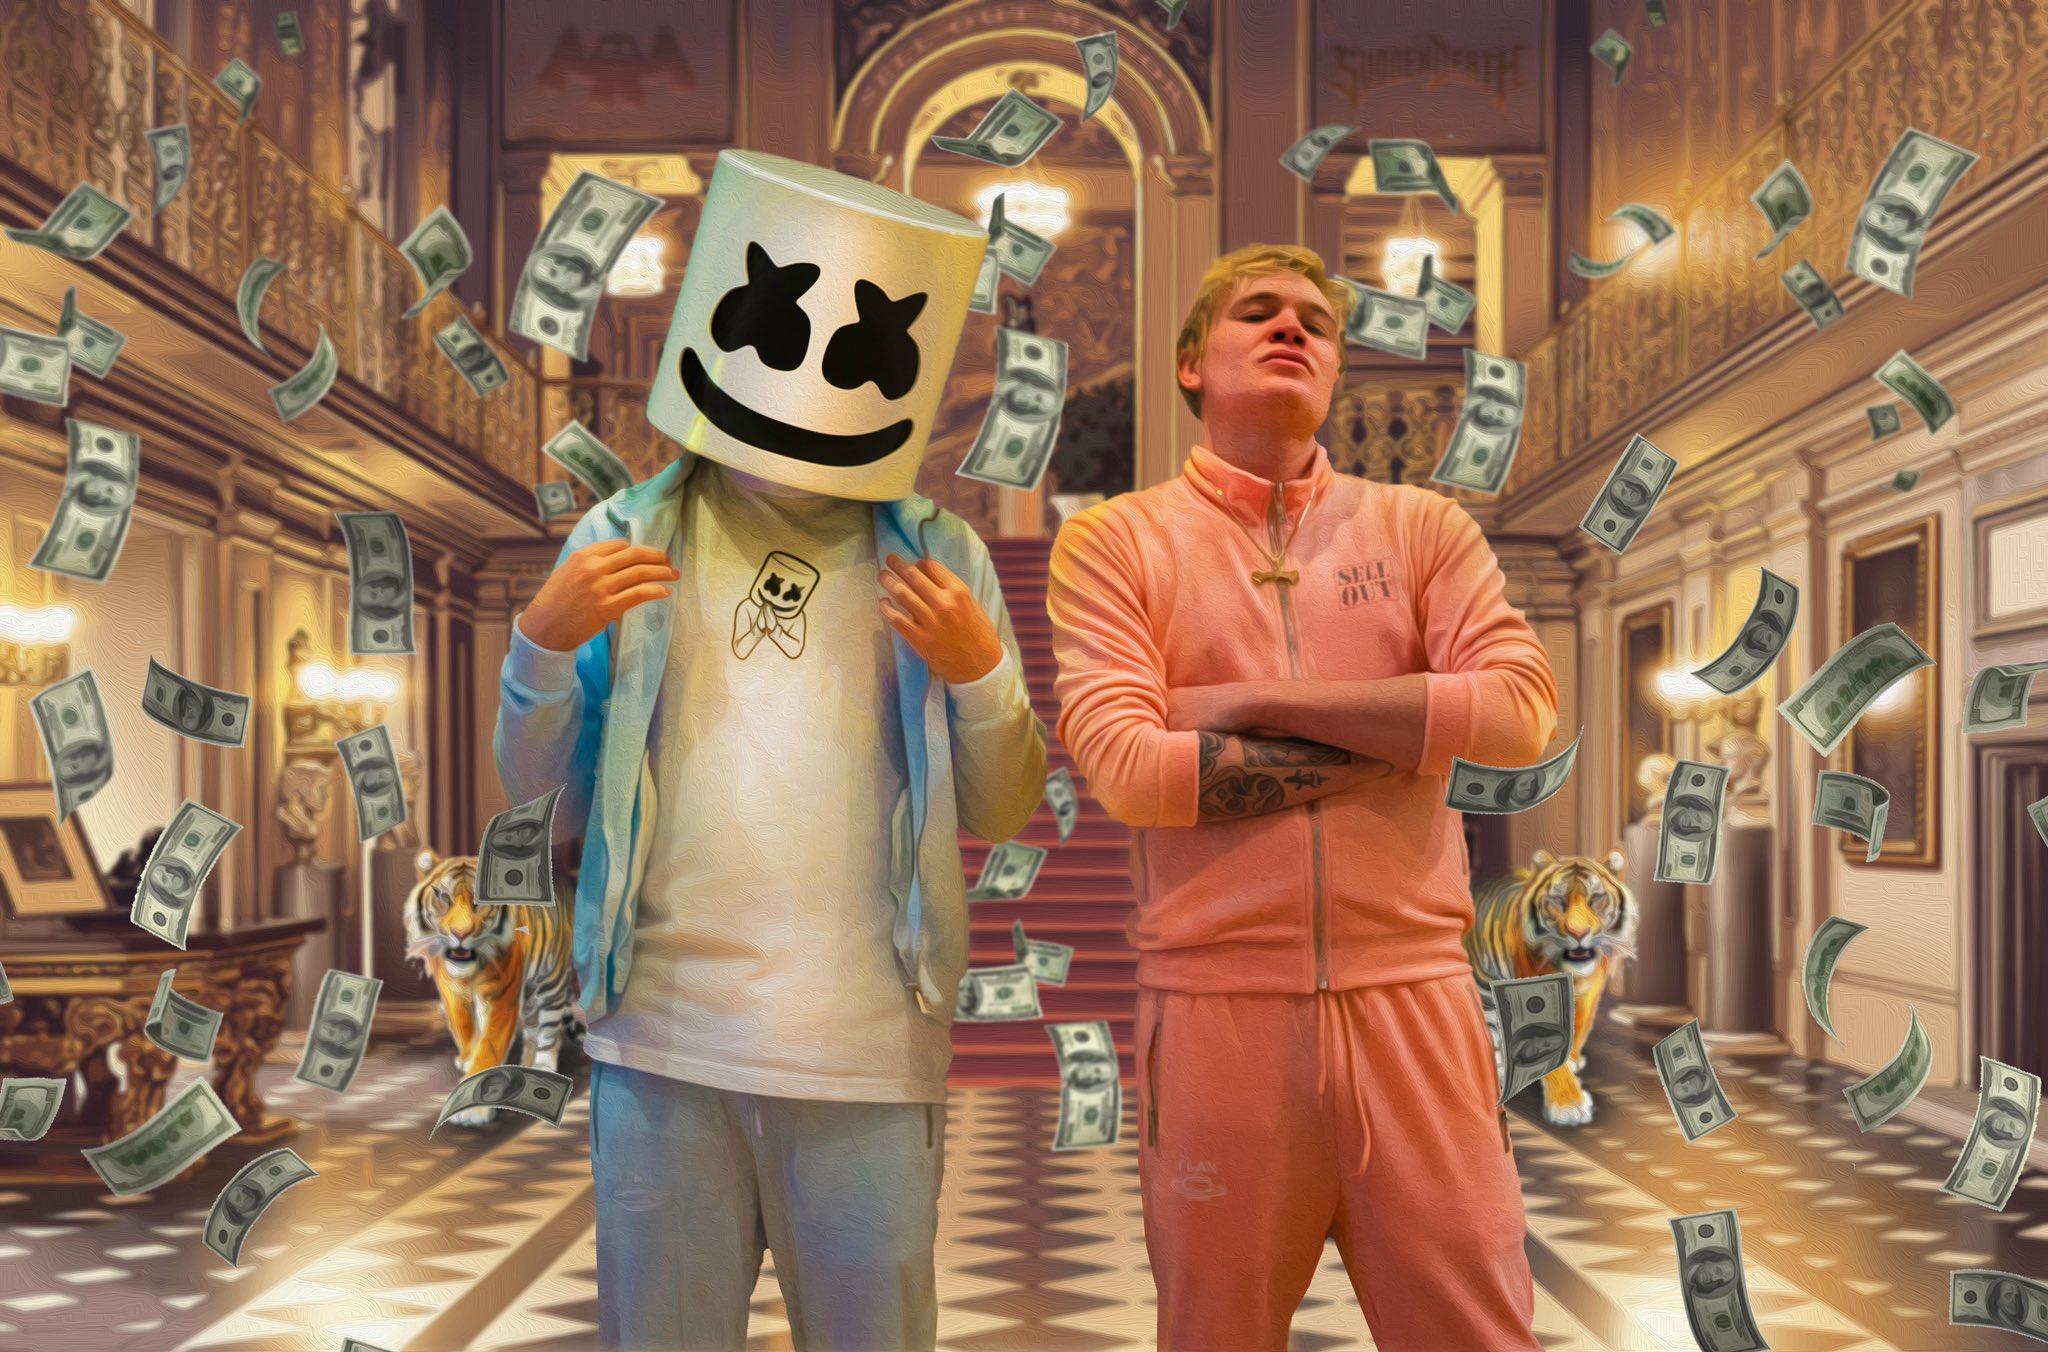 Take a Listen to Marshmello's Insane Collab with SVDDEN DEATH